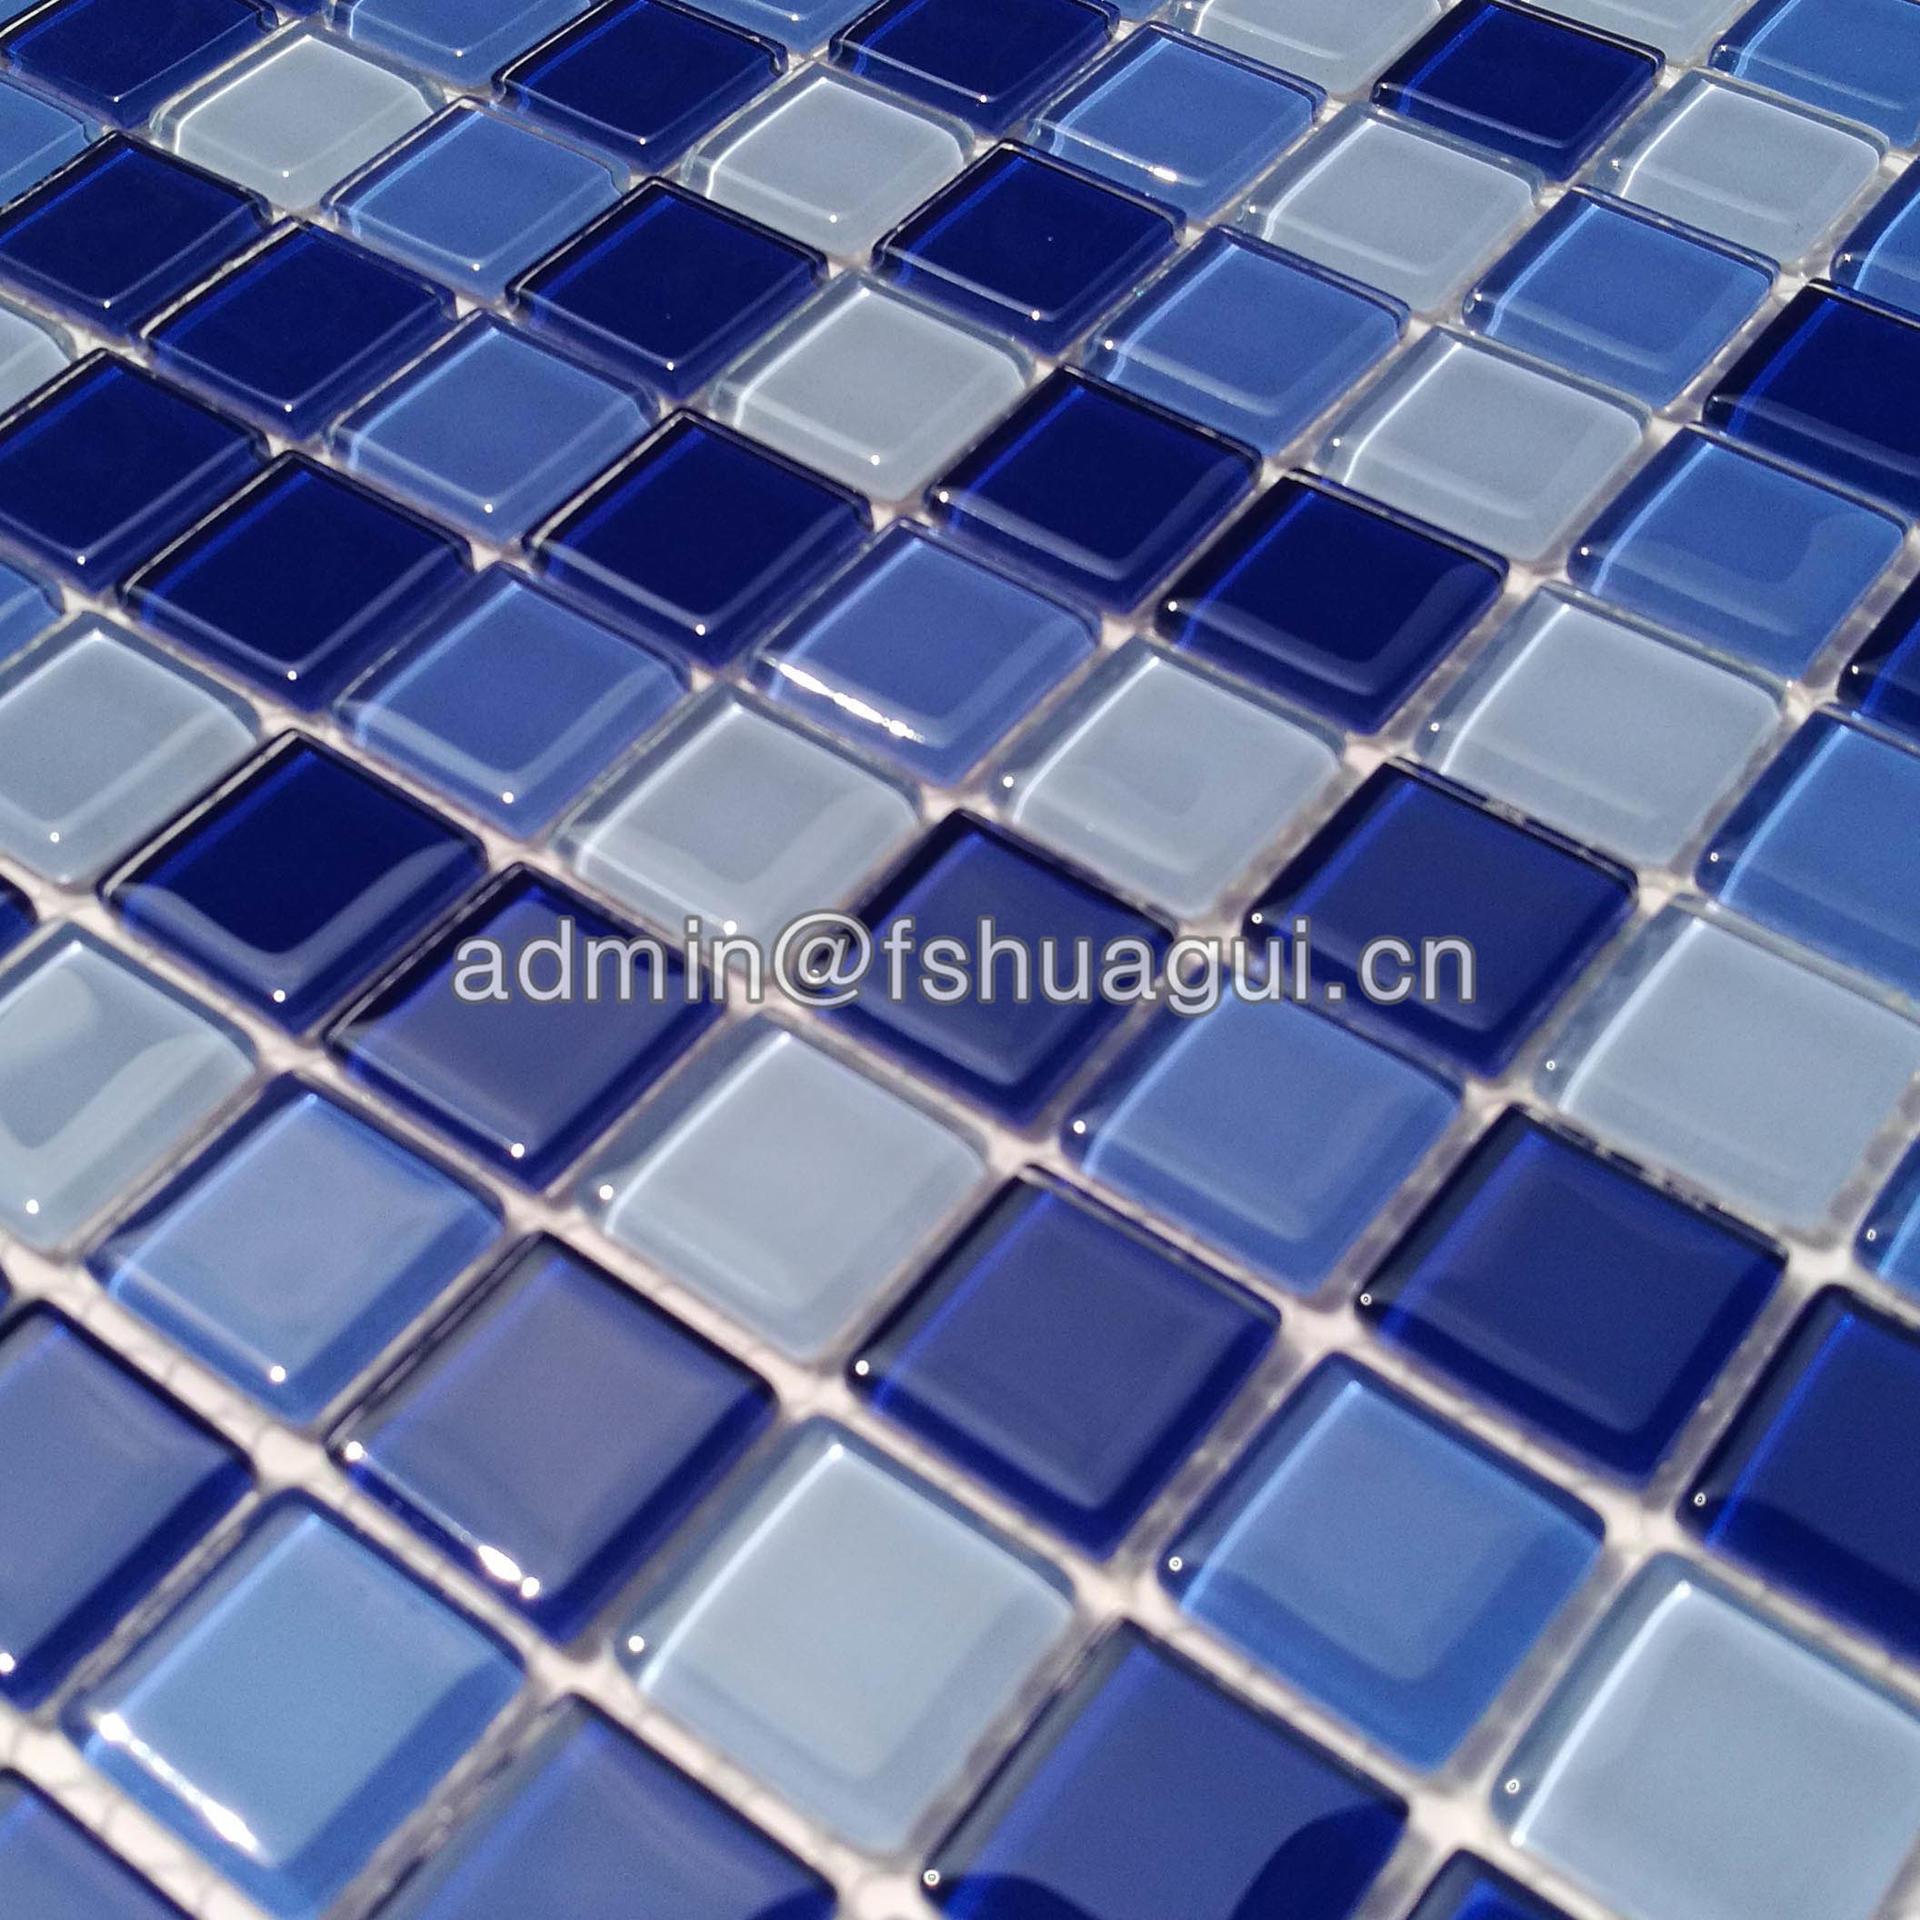 Popular blue ocean glass mosaic swimming pool tile Florida  HG-423010